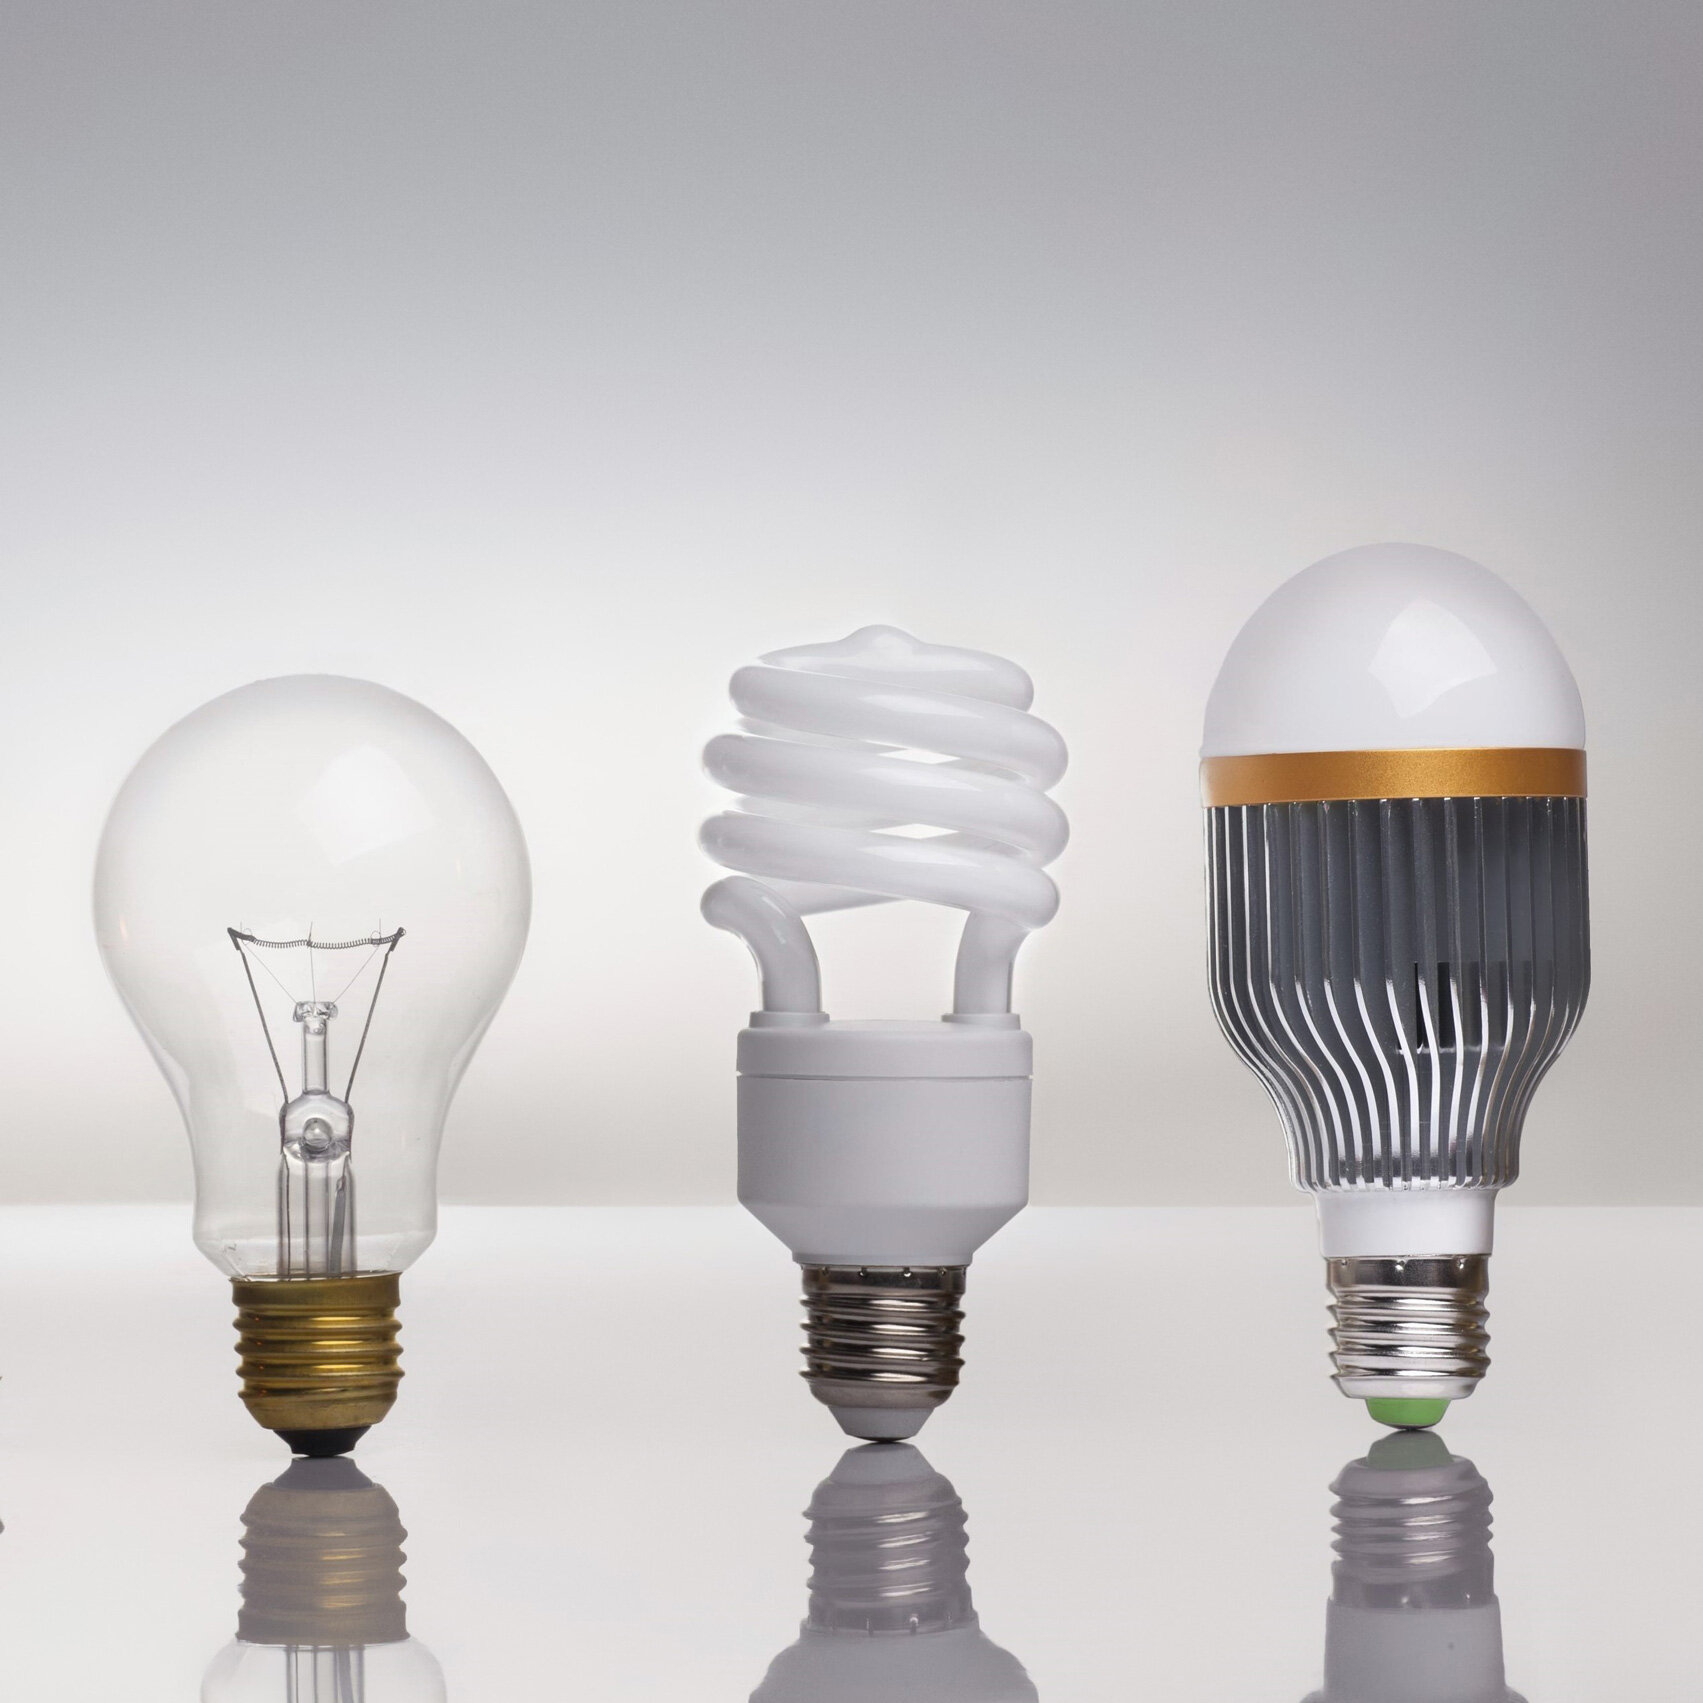 The evolution of the lightbulb over time